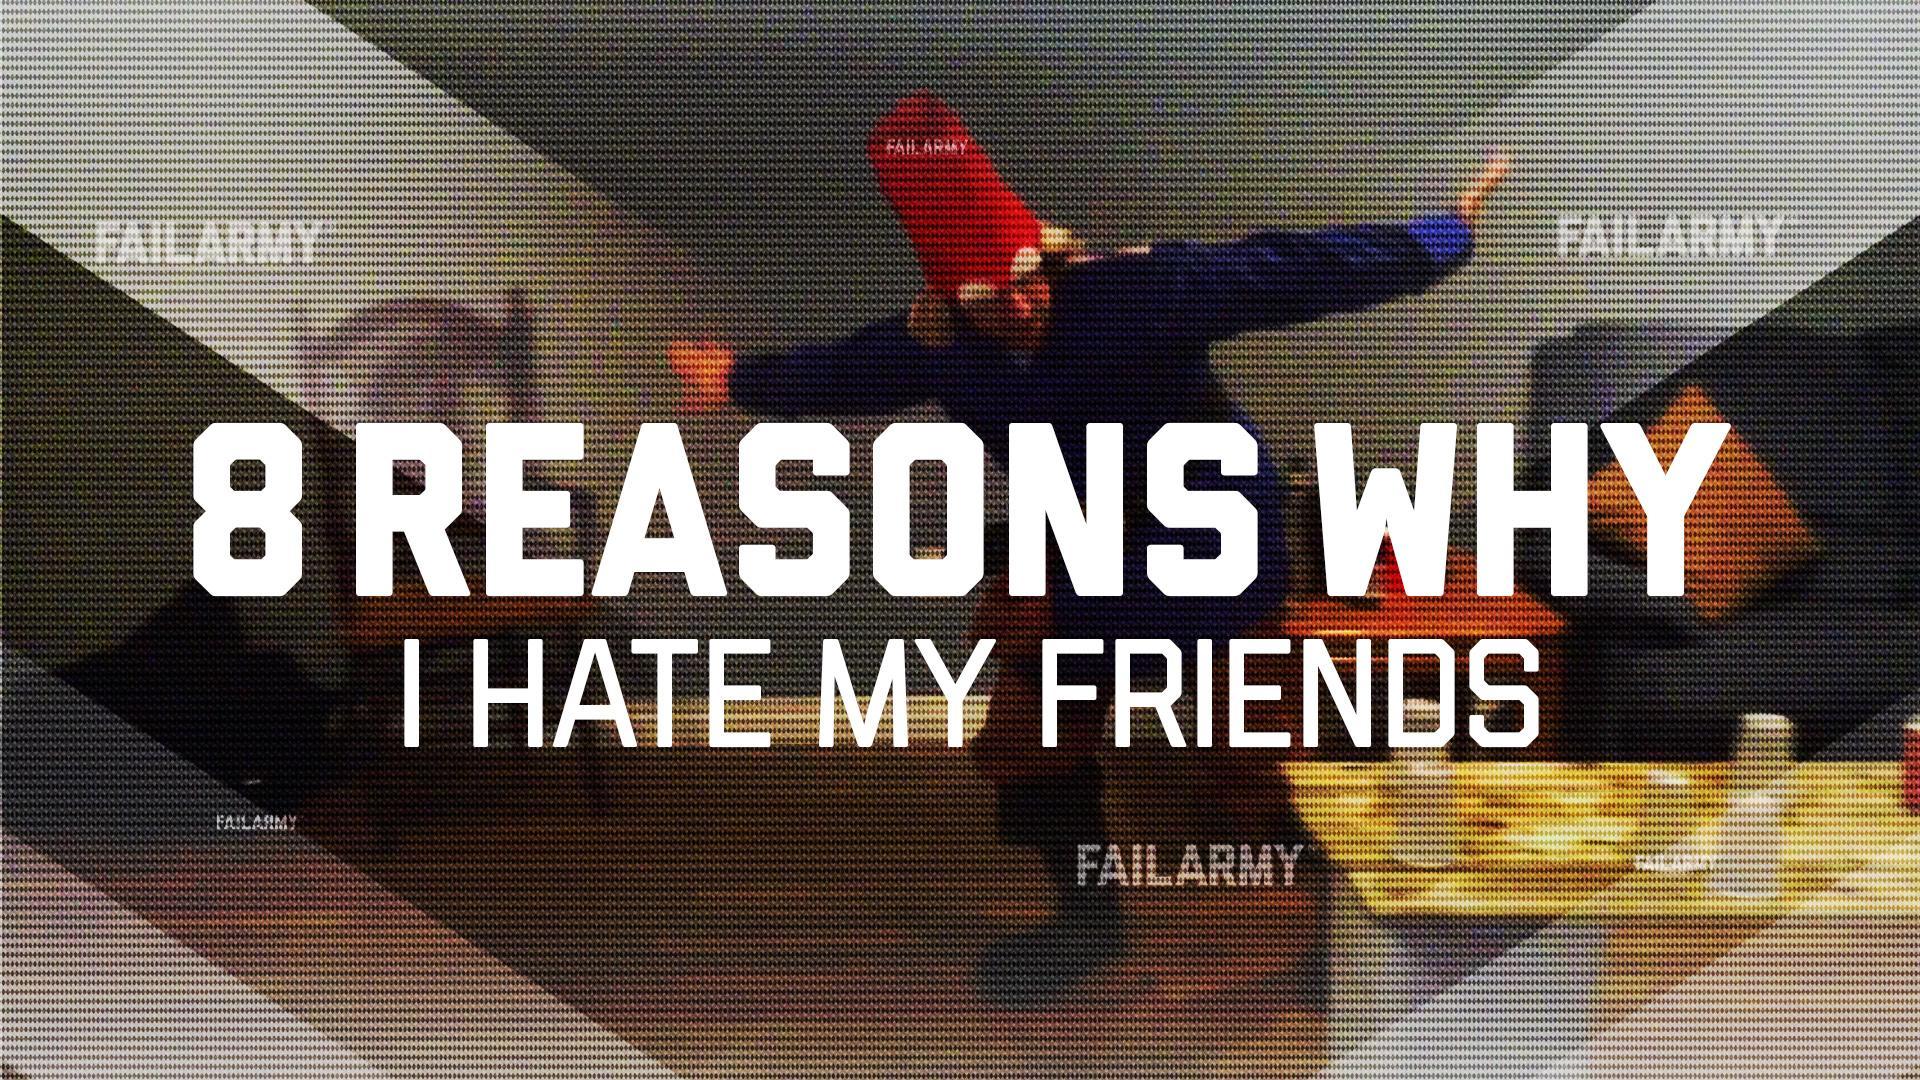 8 Reasons Why I Hate My Friends